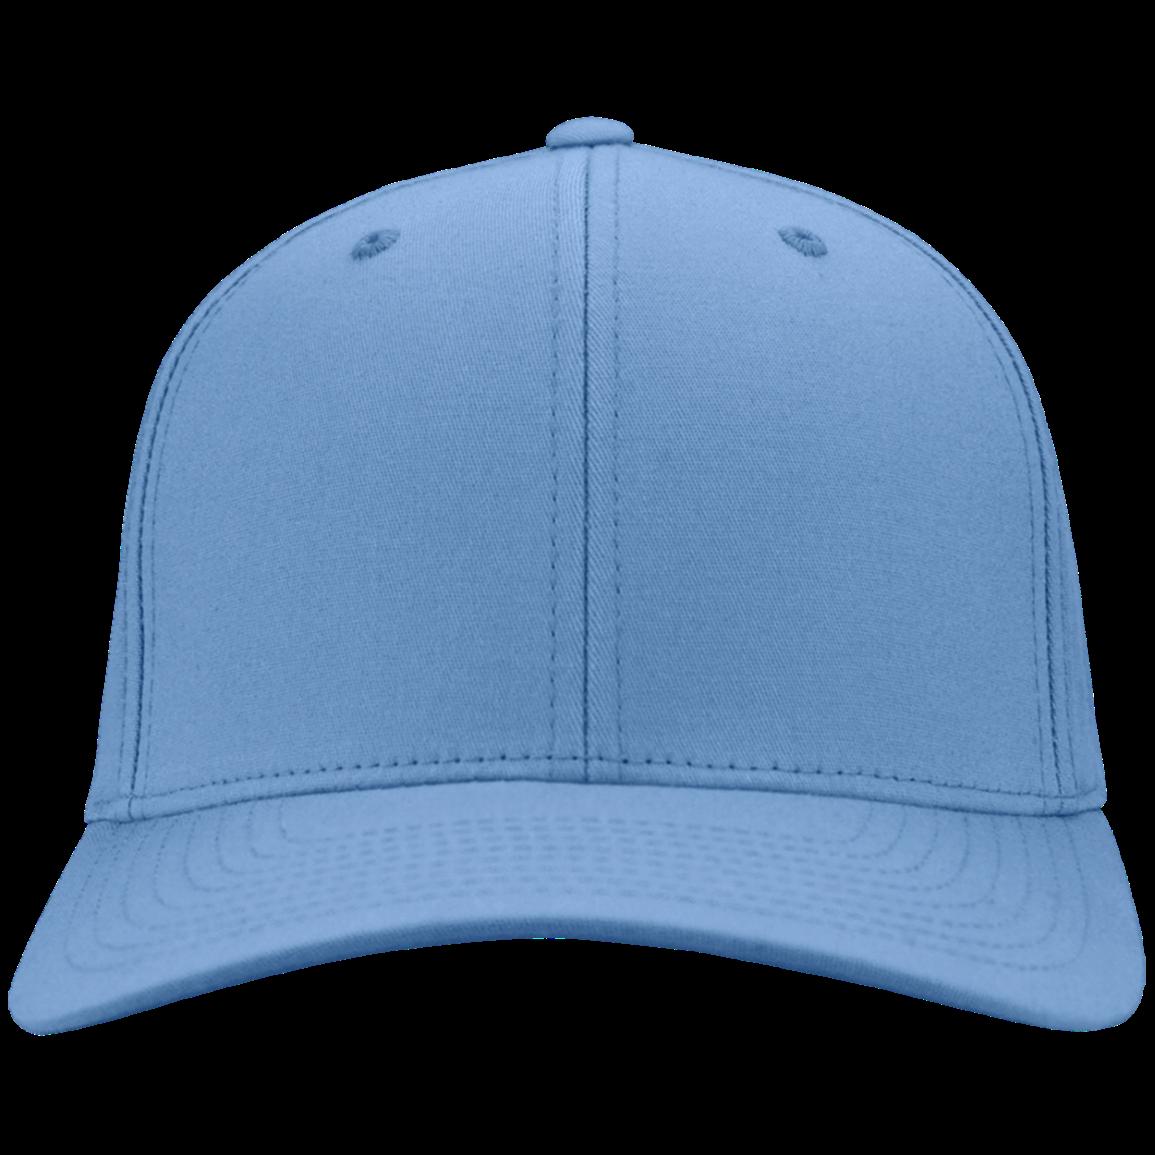 Personalized Twill Cap - Jostens School Stores